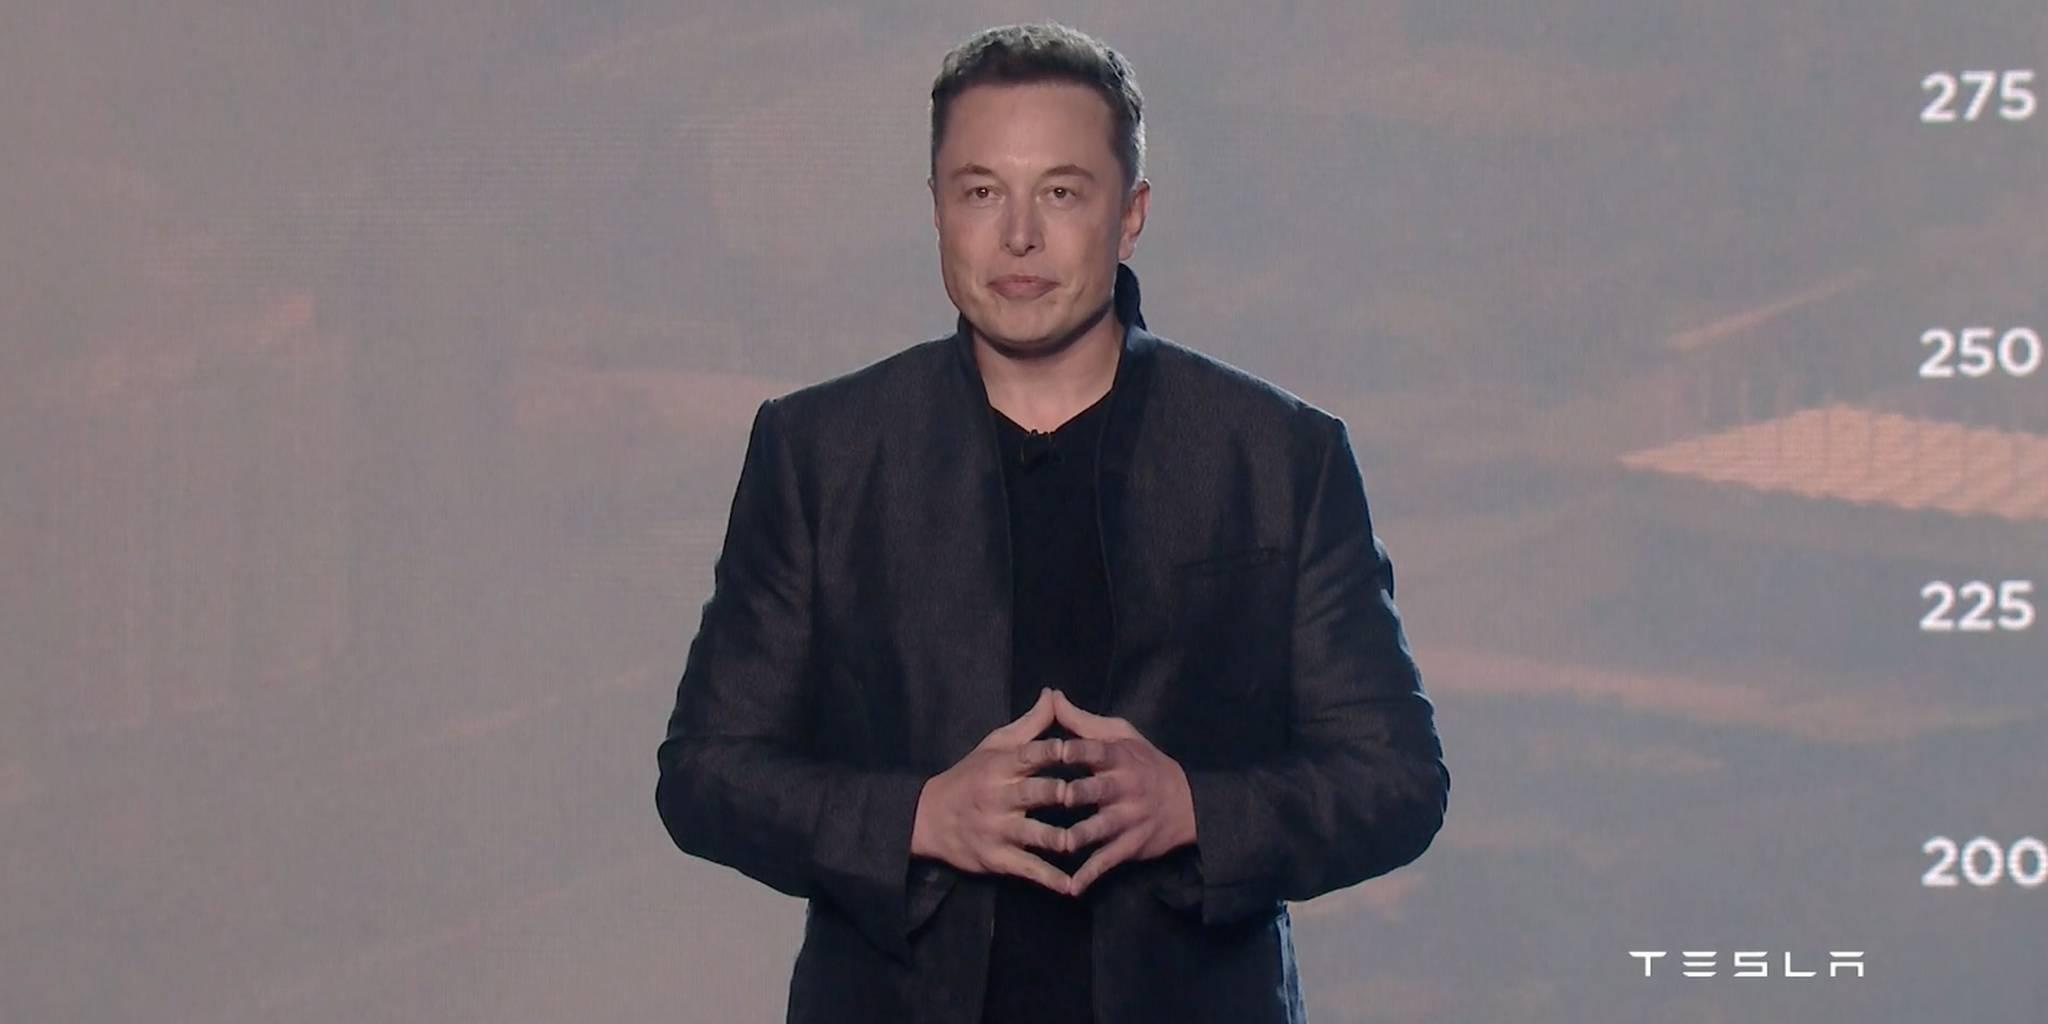 Elon Musk Model 3 unveiling